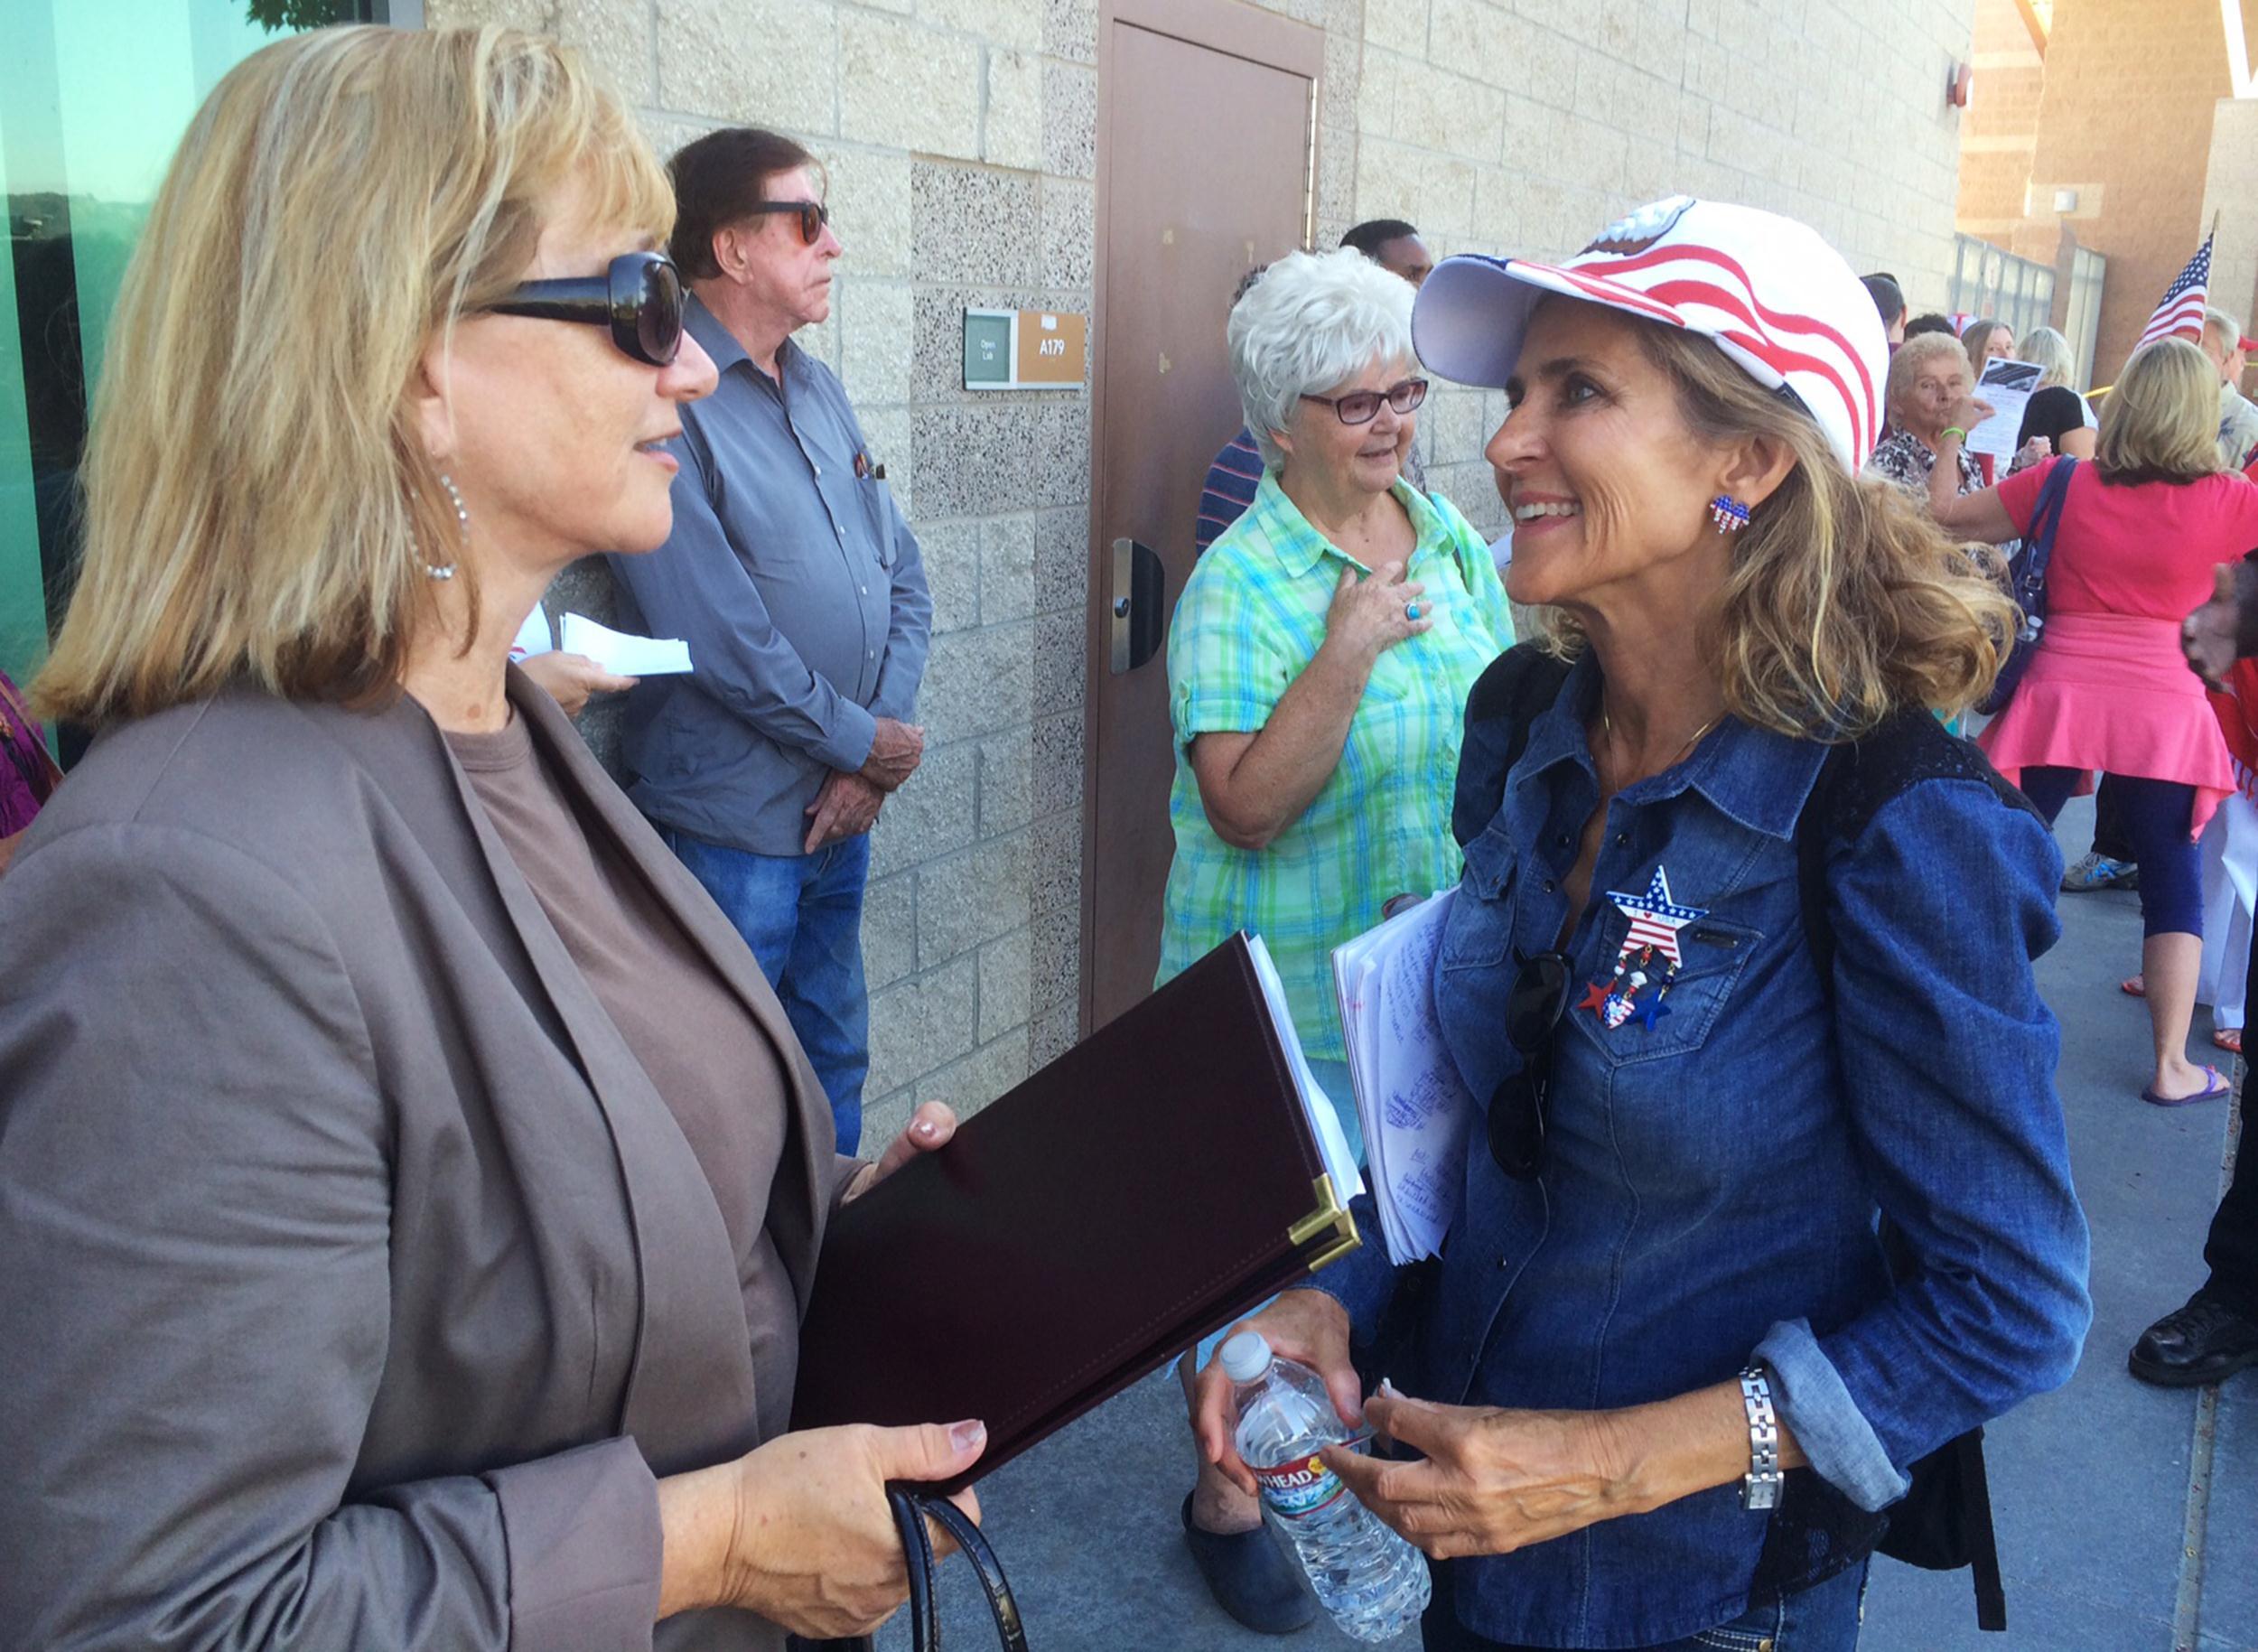 Murrieta protest organizier Patrice Lynes